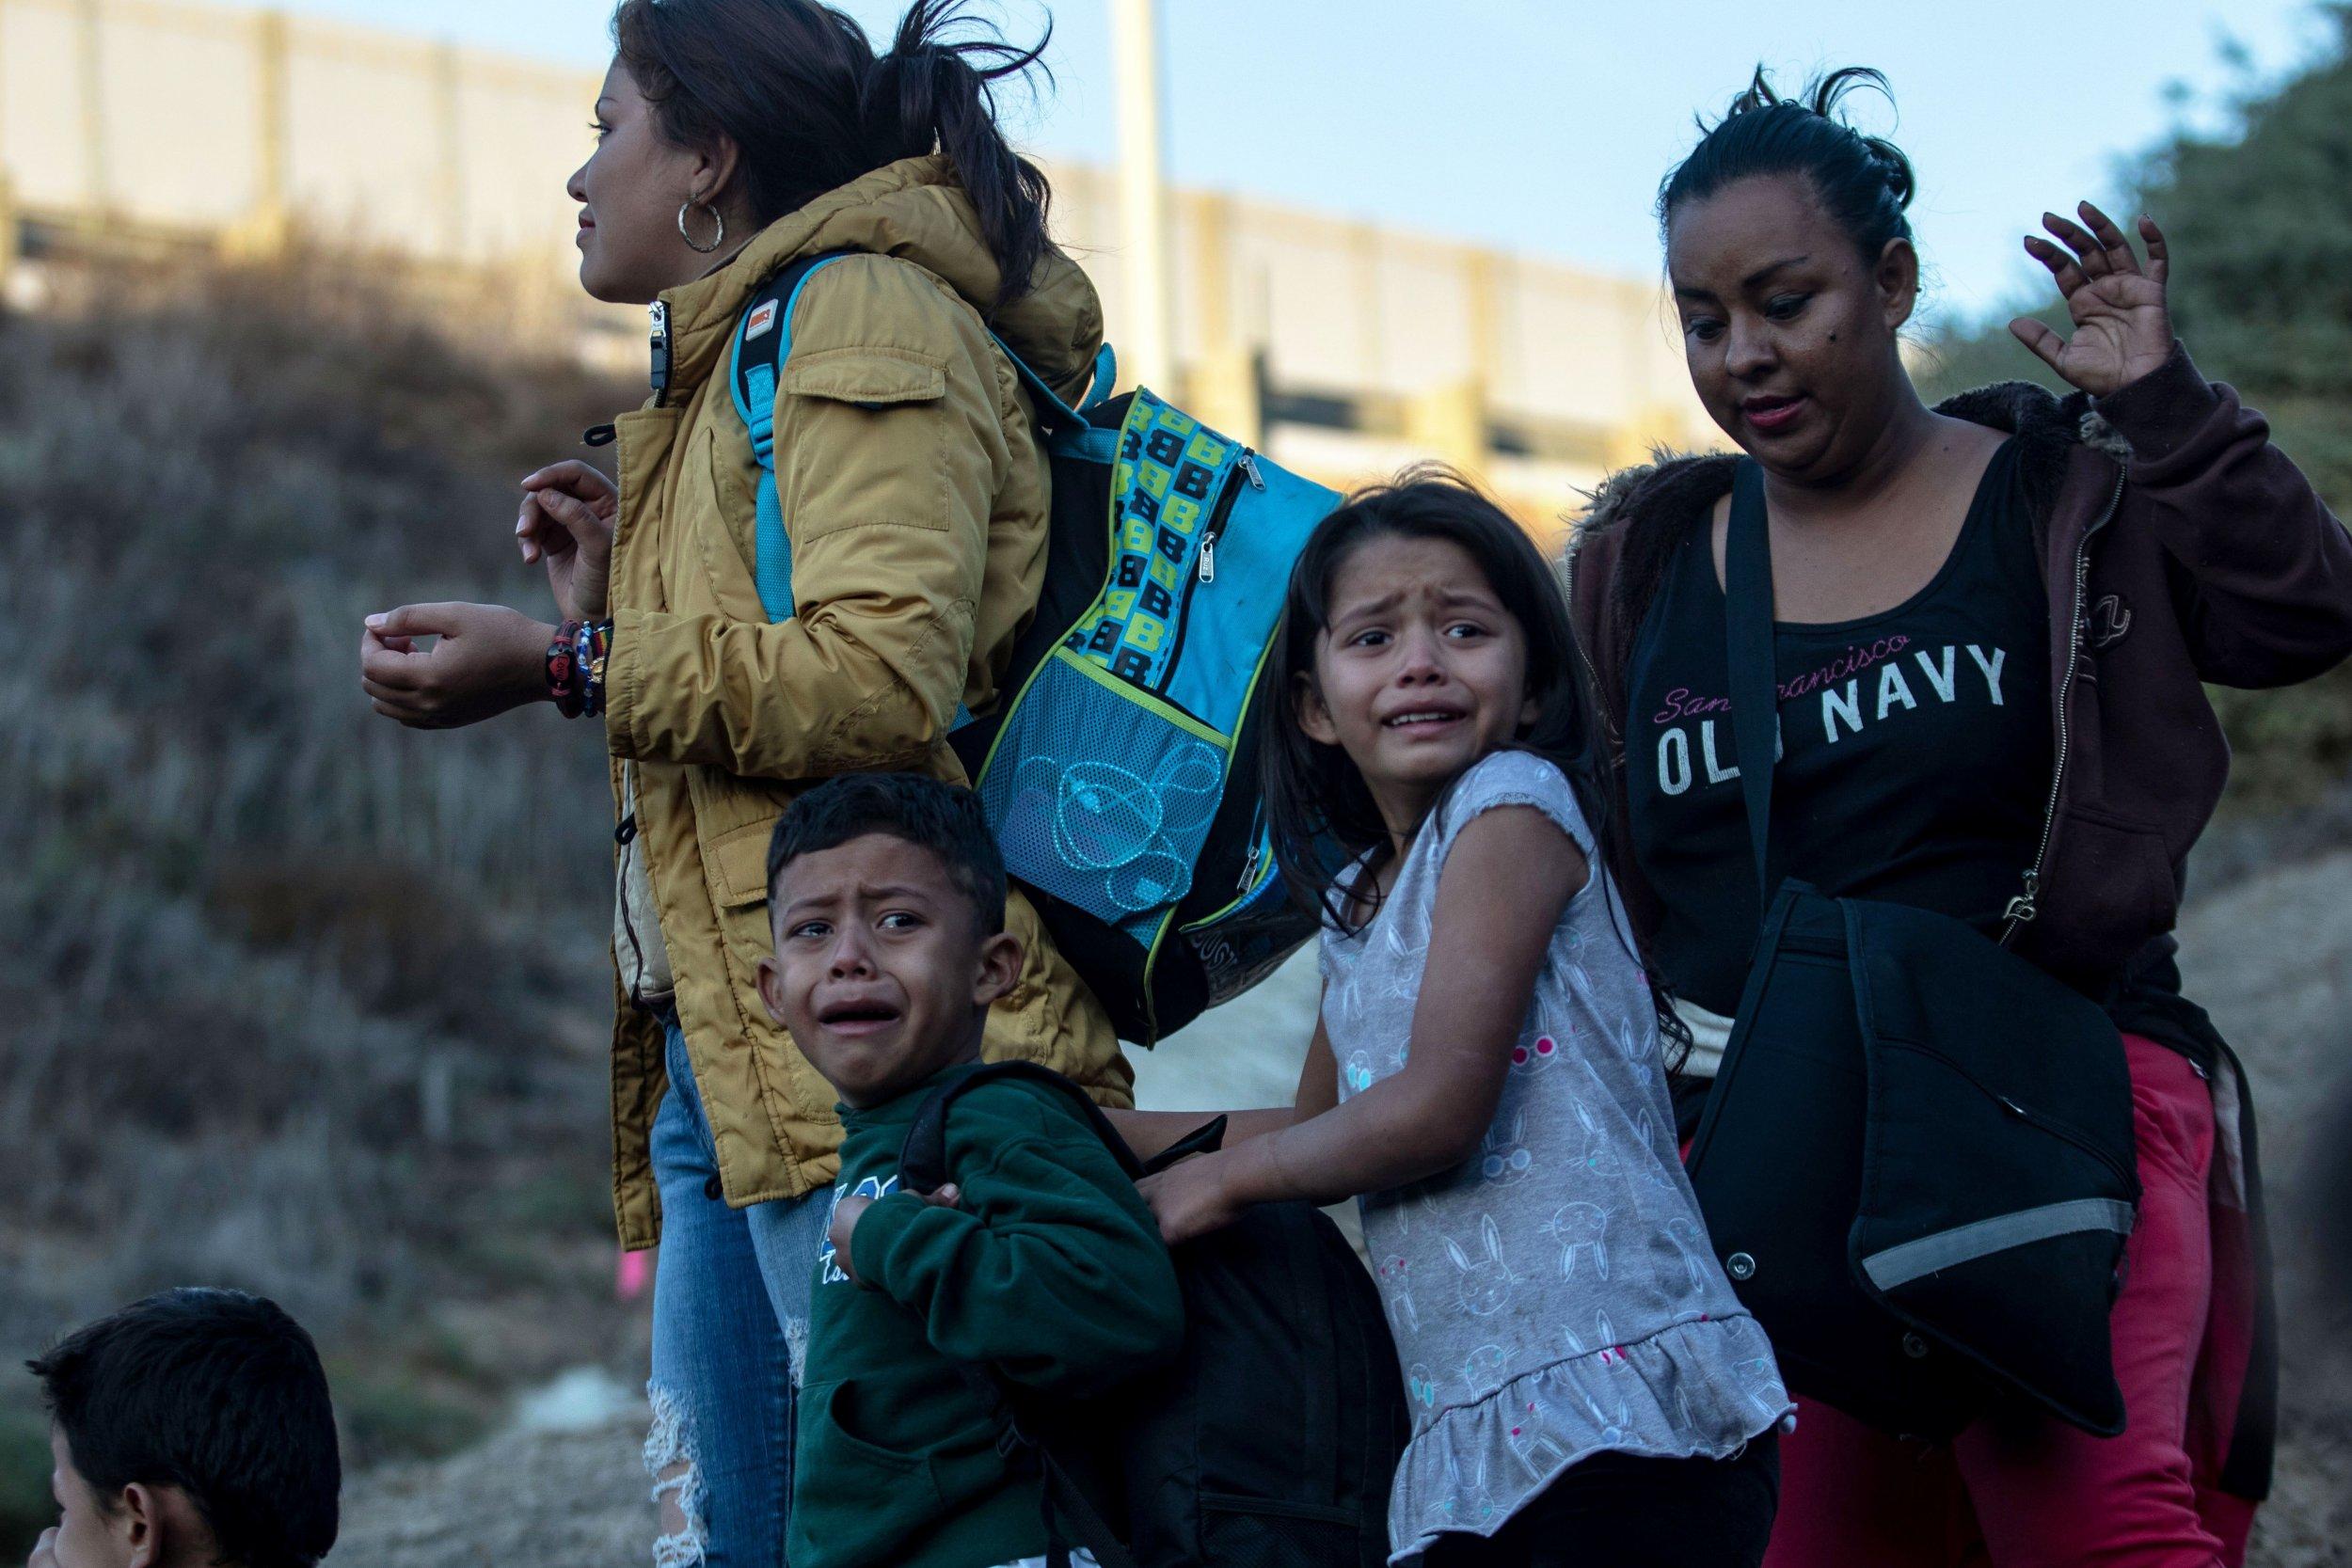 ted, deutch, migrant, children, abuse, custody, immigration